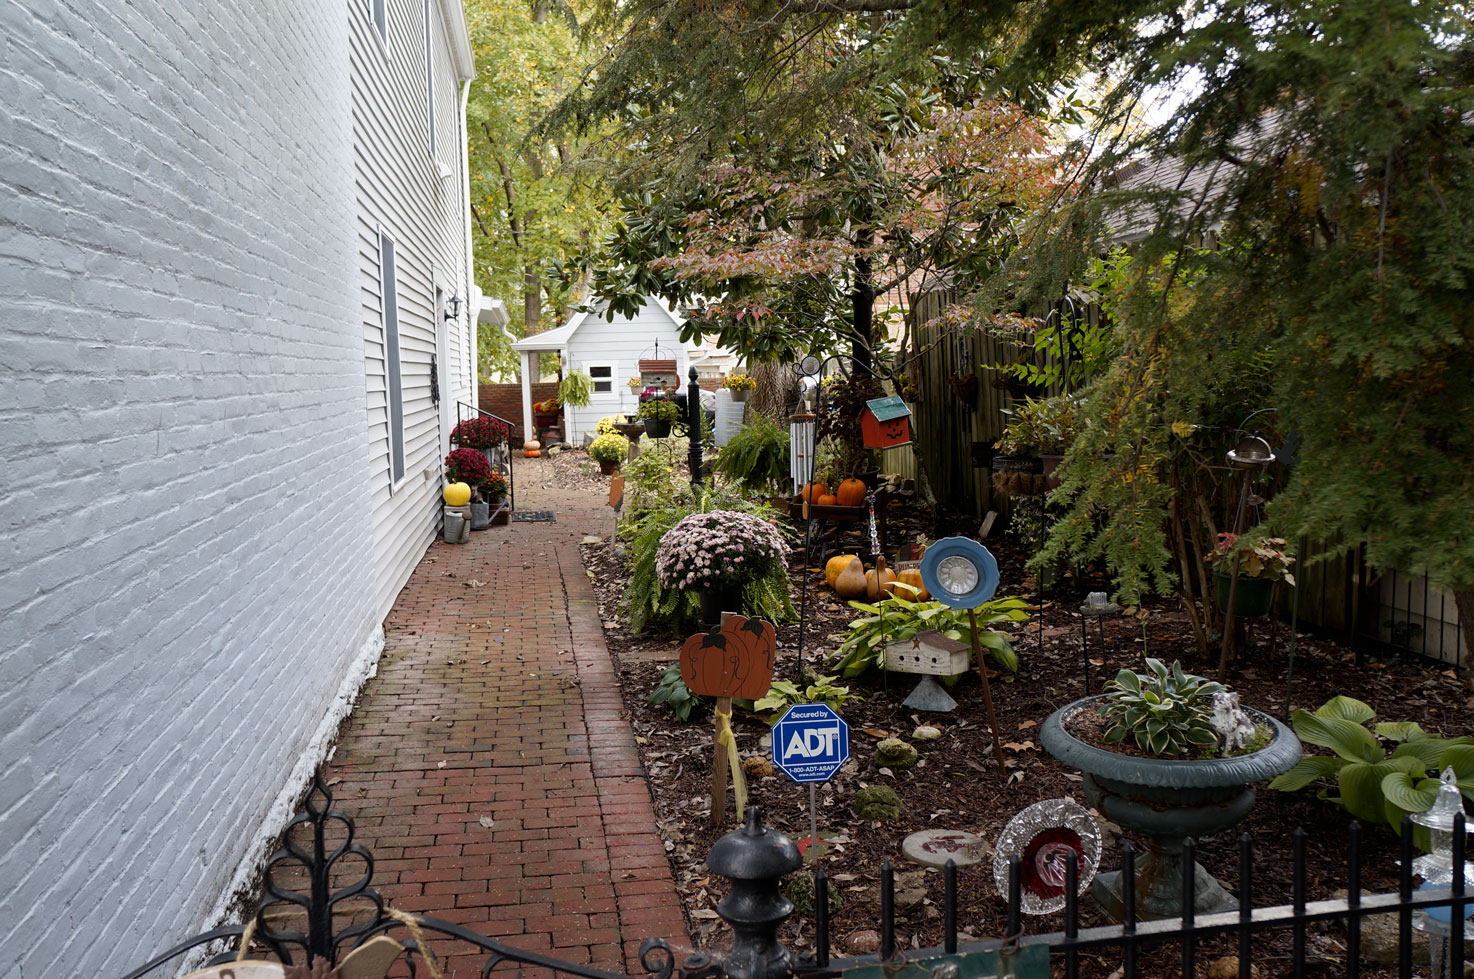 Little garden house - _dsc5412